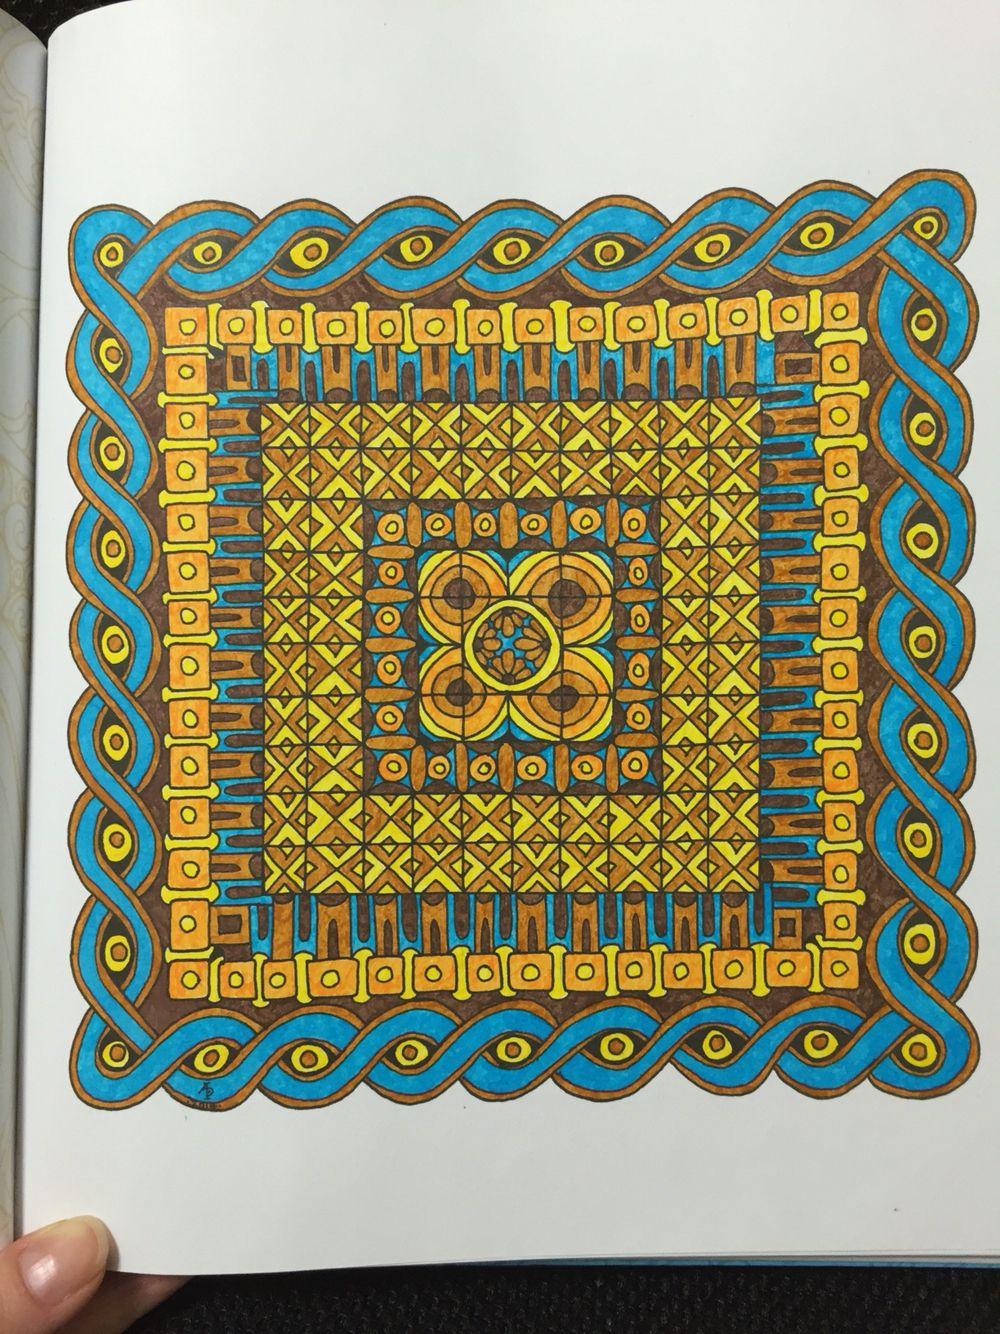 Color Me Calm, Angela Porter. Geometric Patterns, page 1